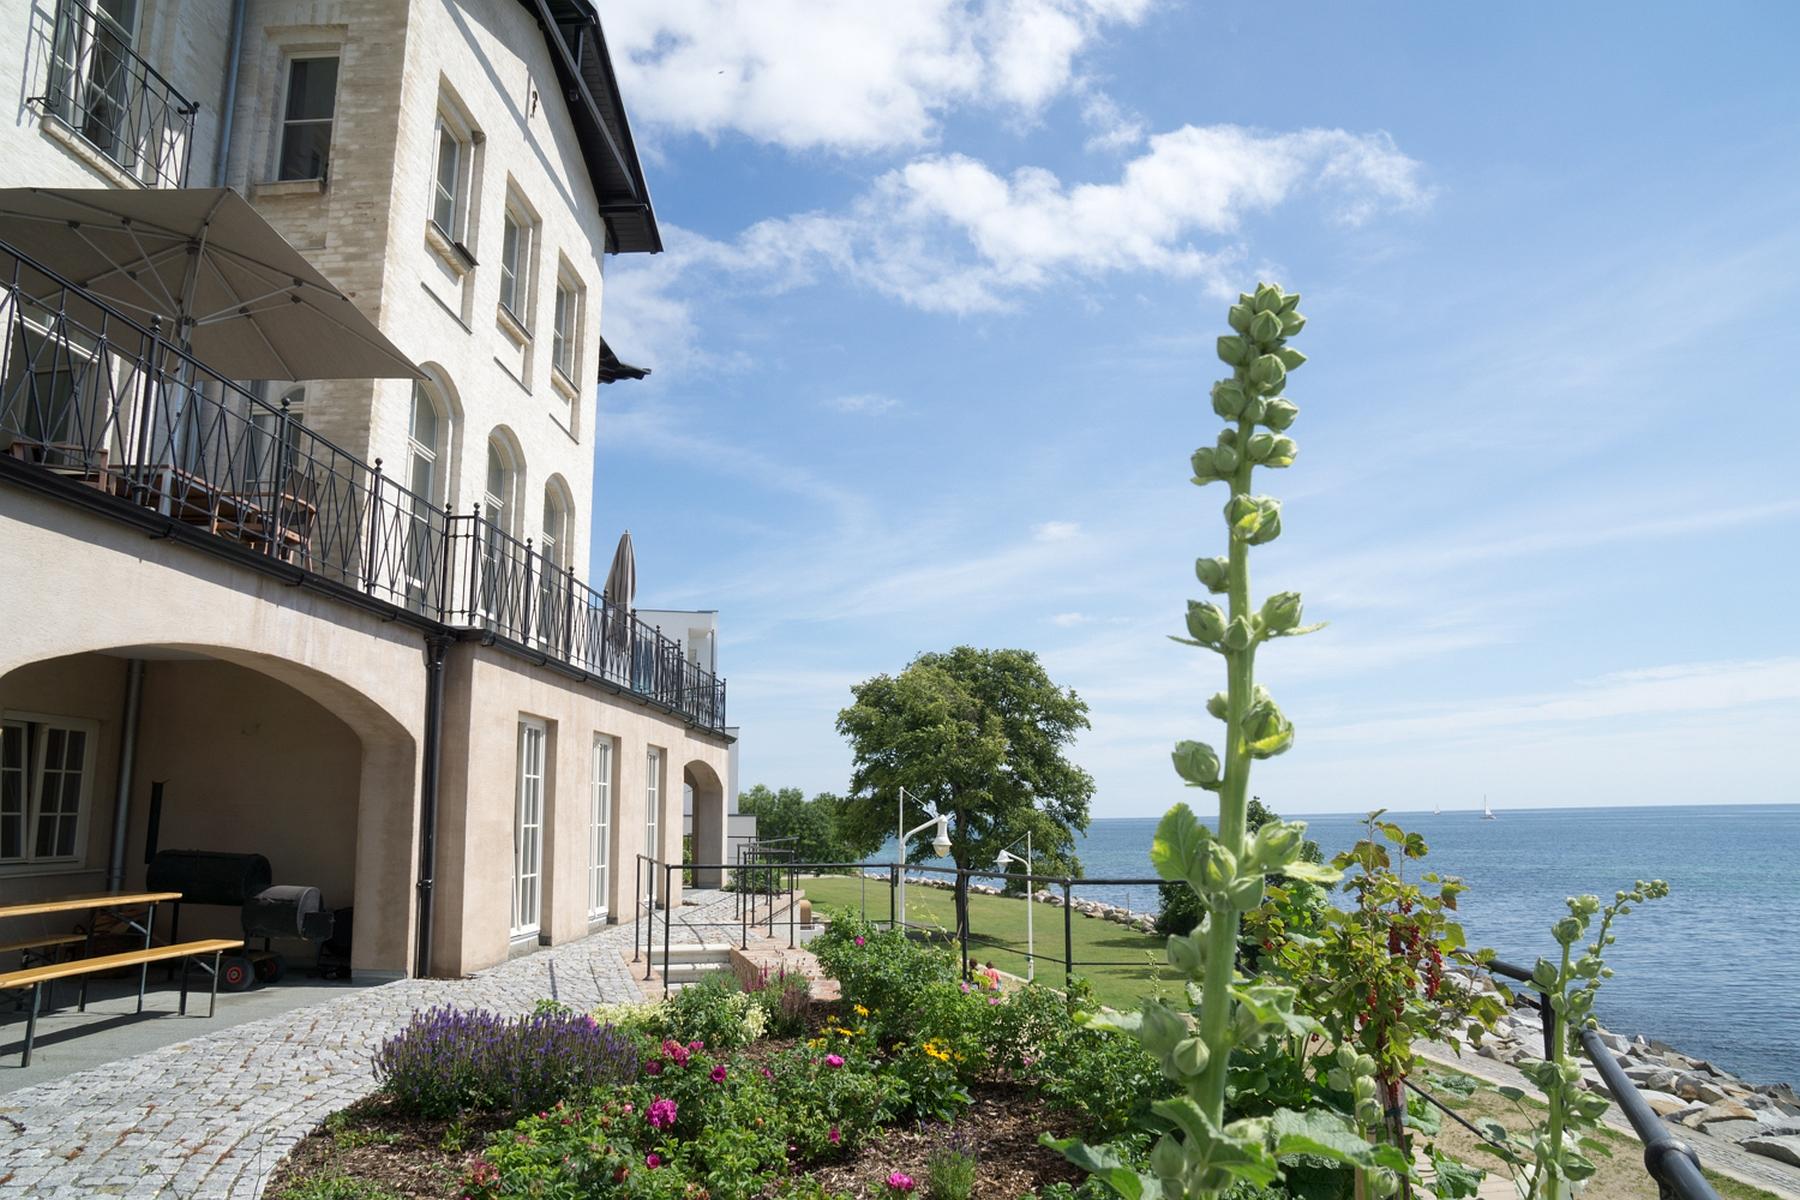 Residencial - Outro para Venda às Exclusive Mansion at Germanys biggest Island Sassnitz, Mecklenburg Vorpommern, 18546 Alemanha